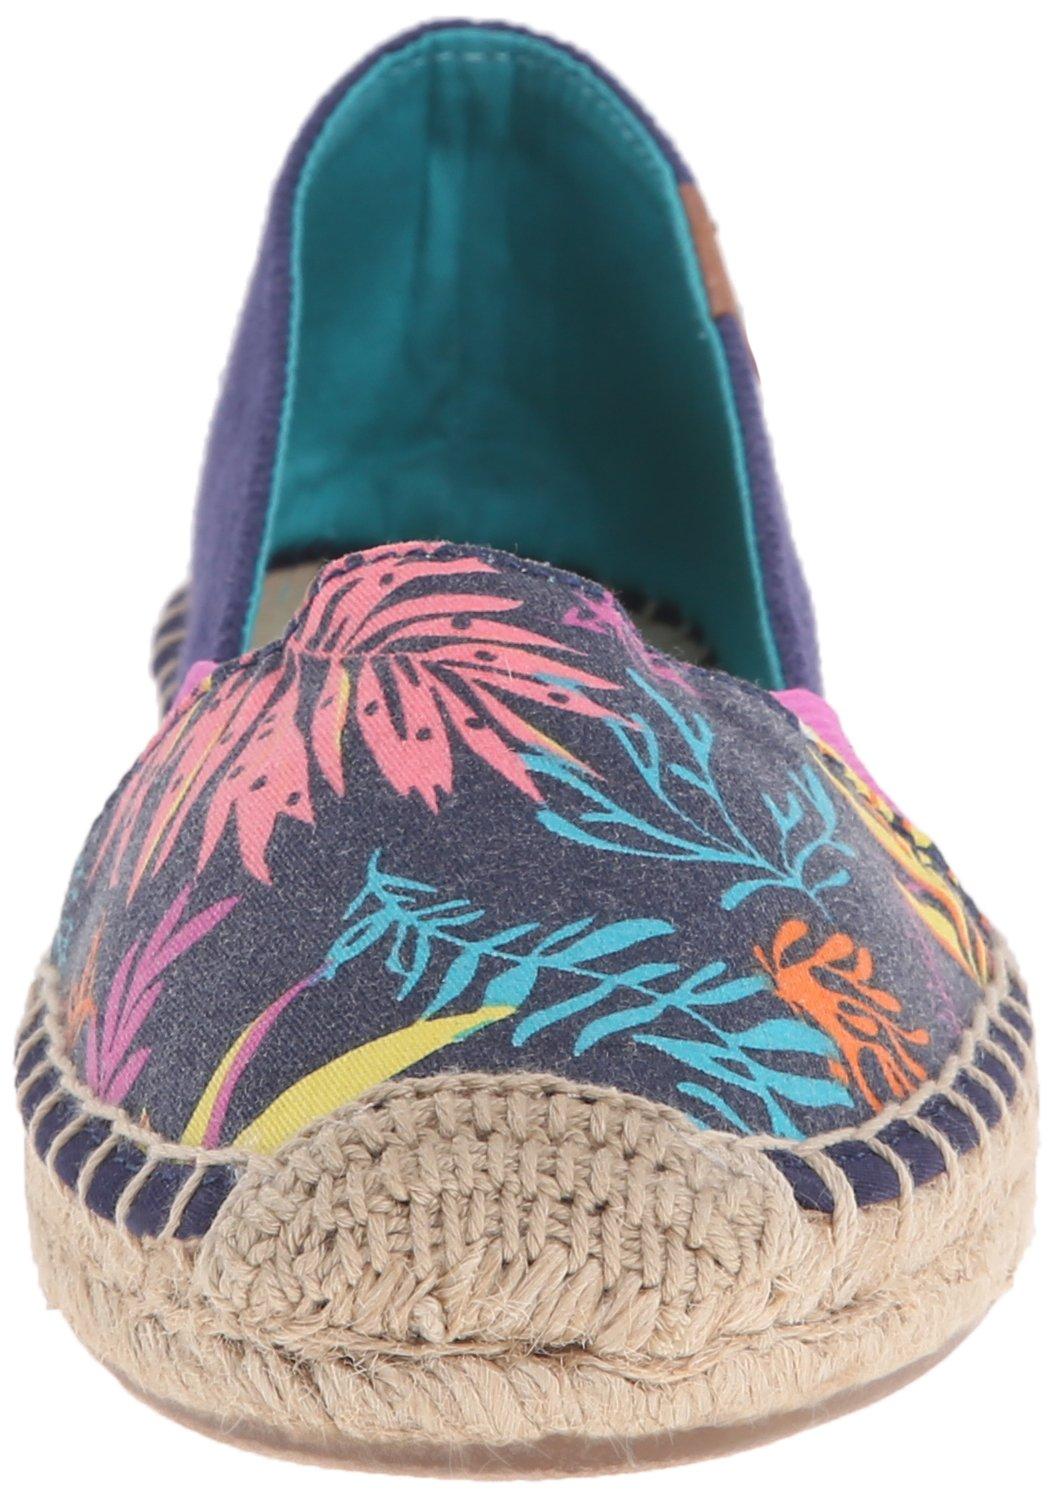 Sperry Top-Sider Women's Katama Cape Ballet Flat B01015RYKM 7.5 B(M) US|Prints Blue Seaweed